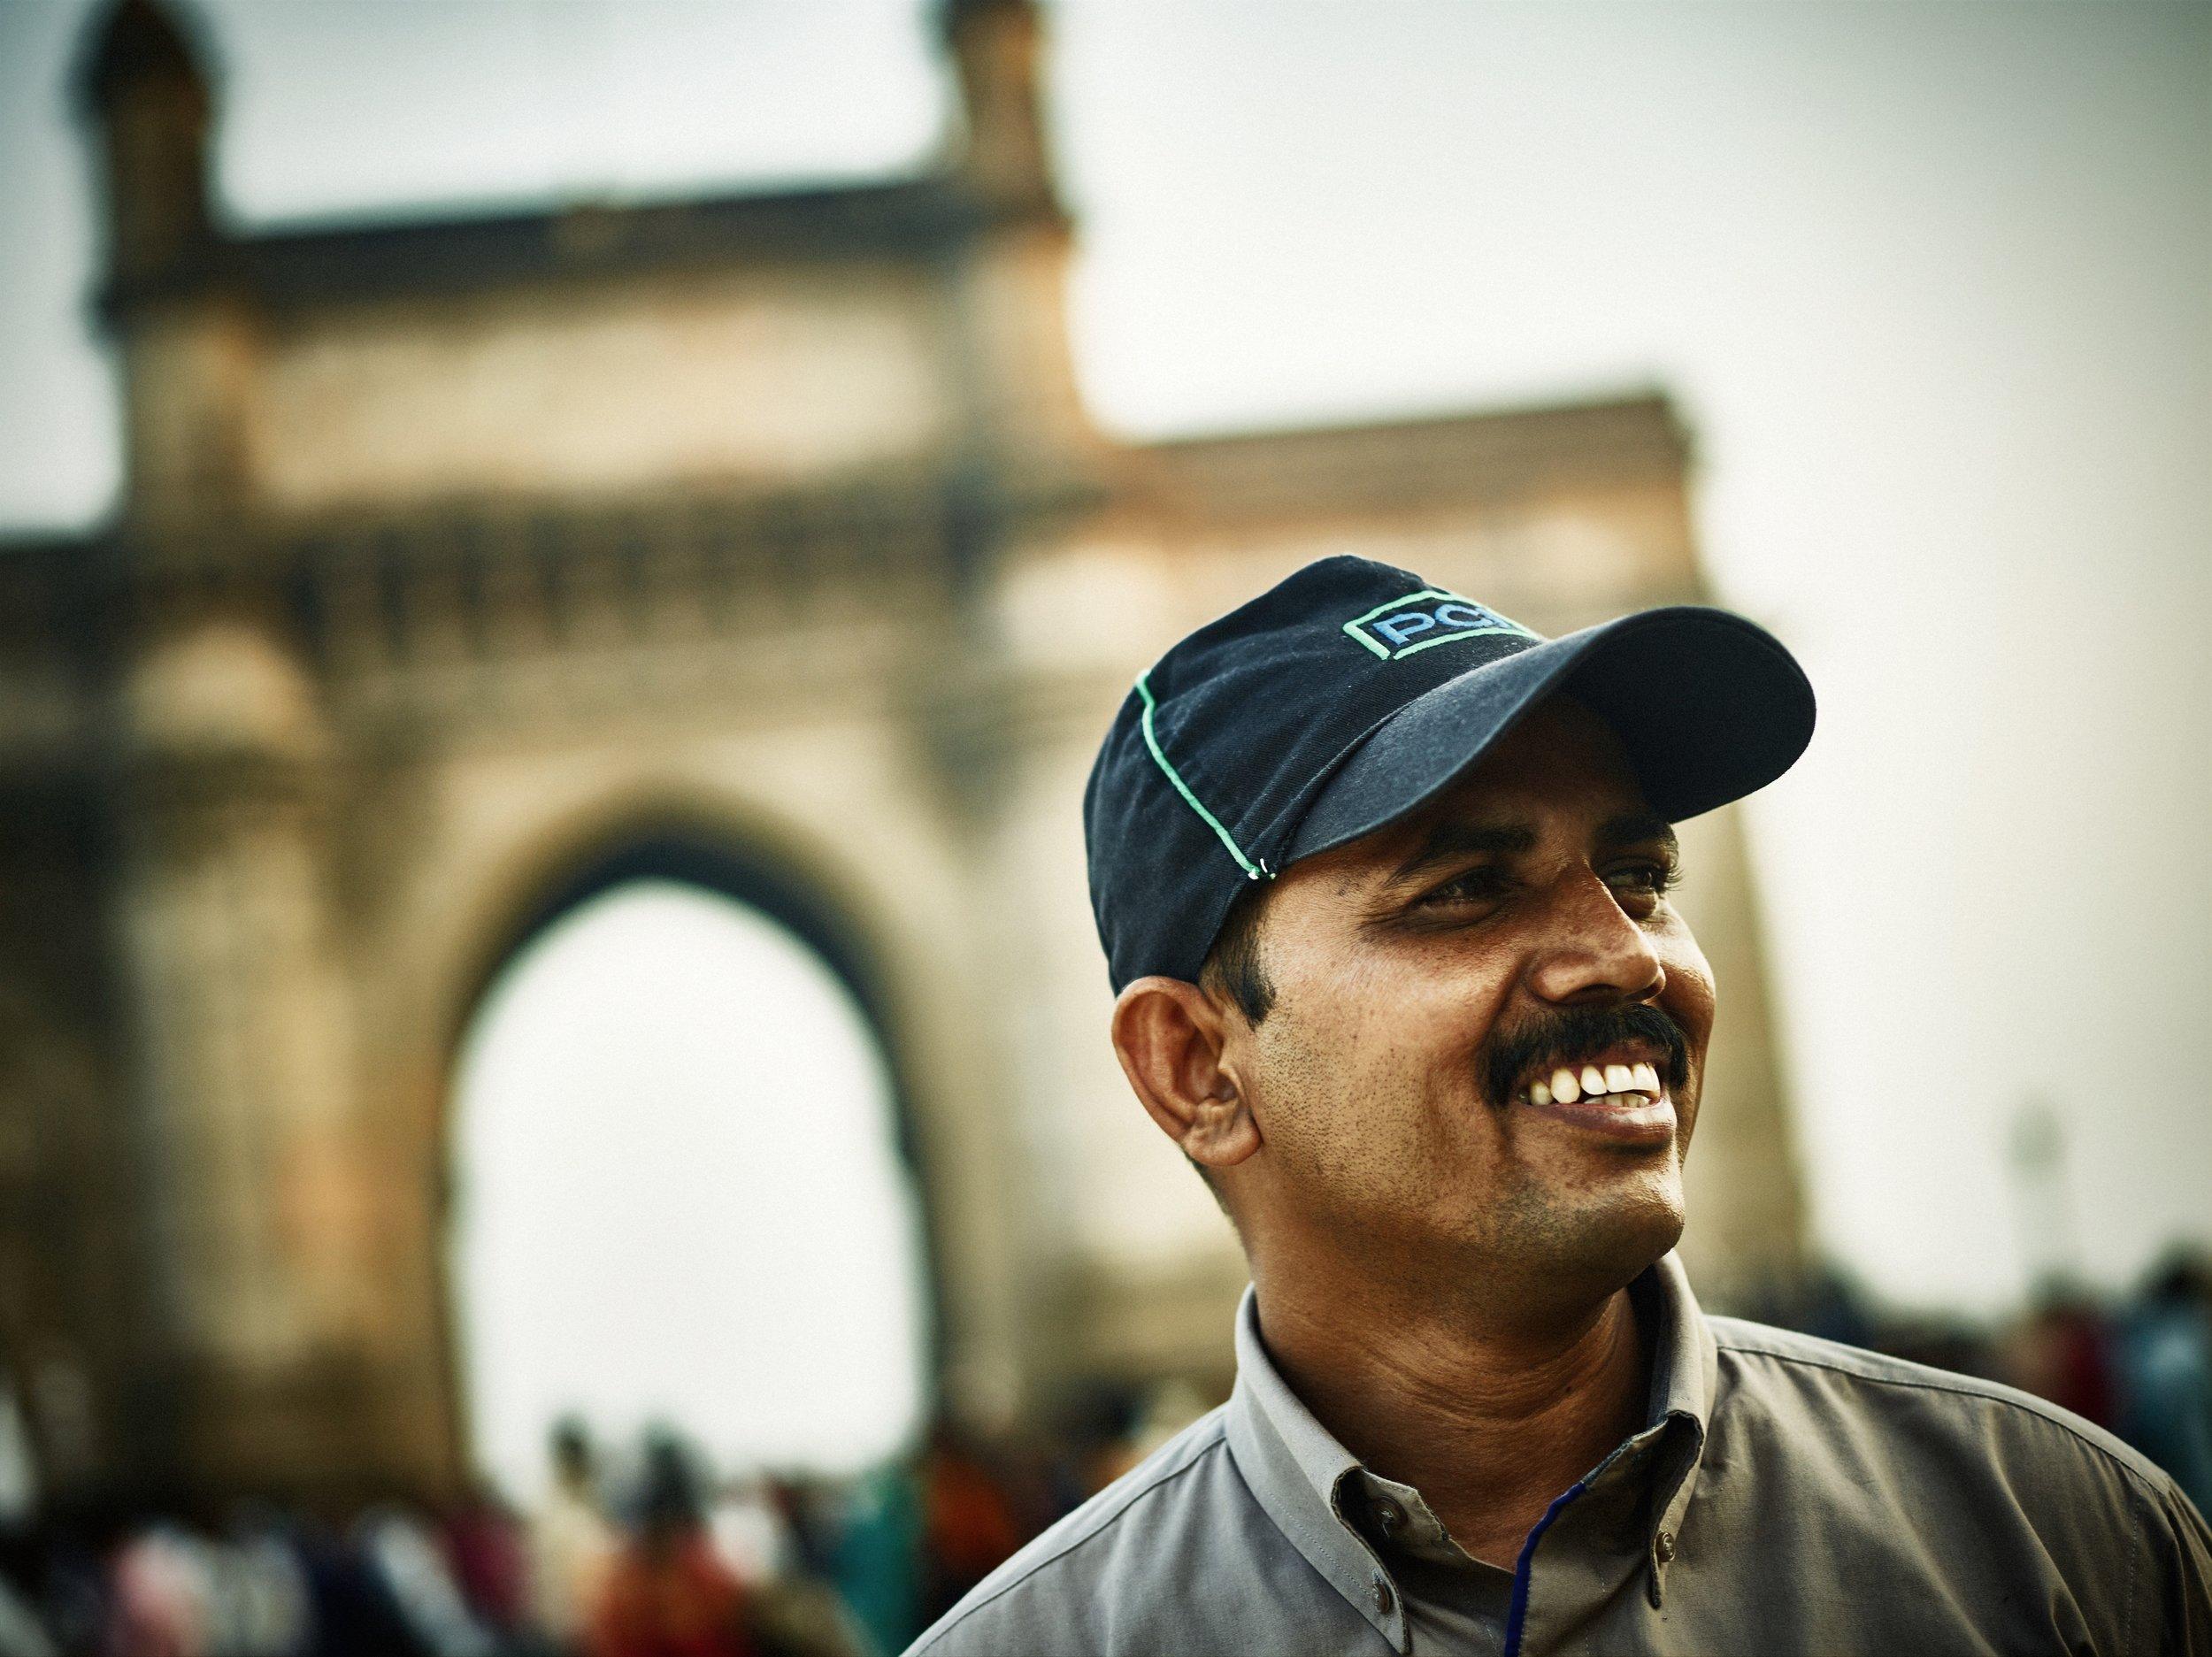 Rentokil India Annual Report Photo Shoot by Matthew Lloyd